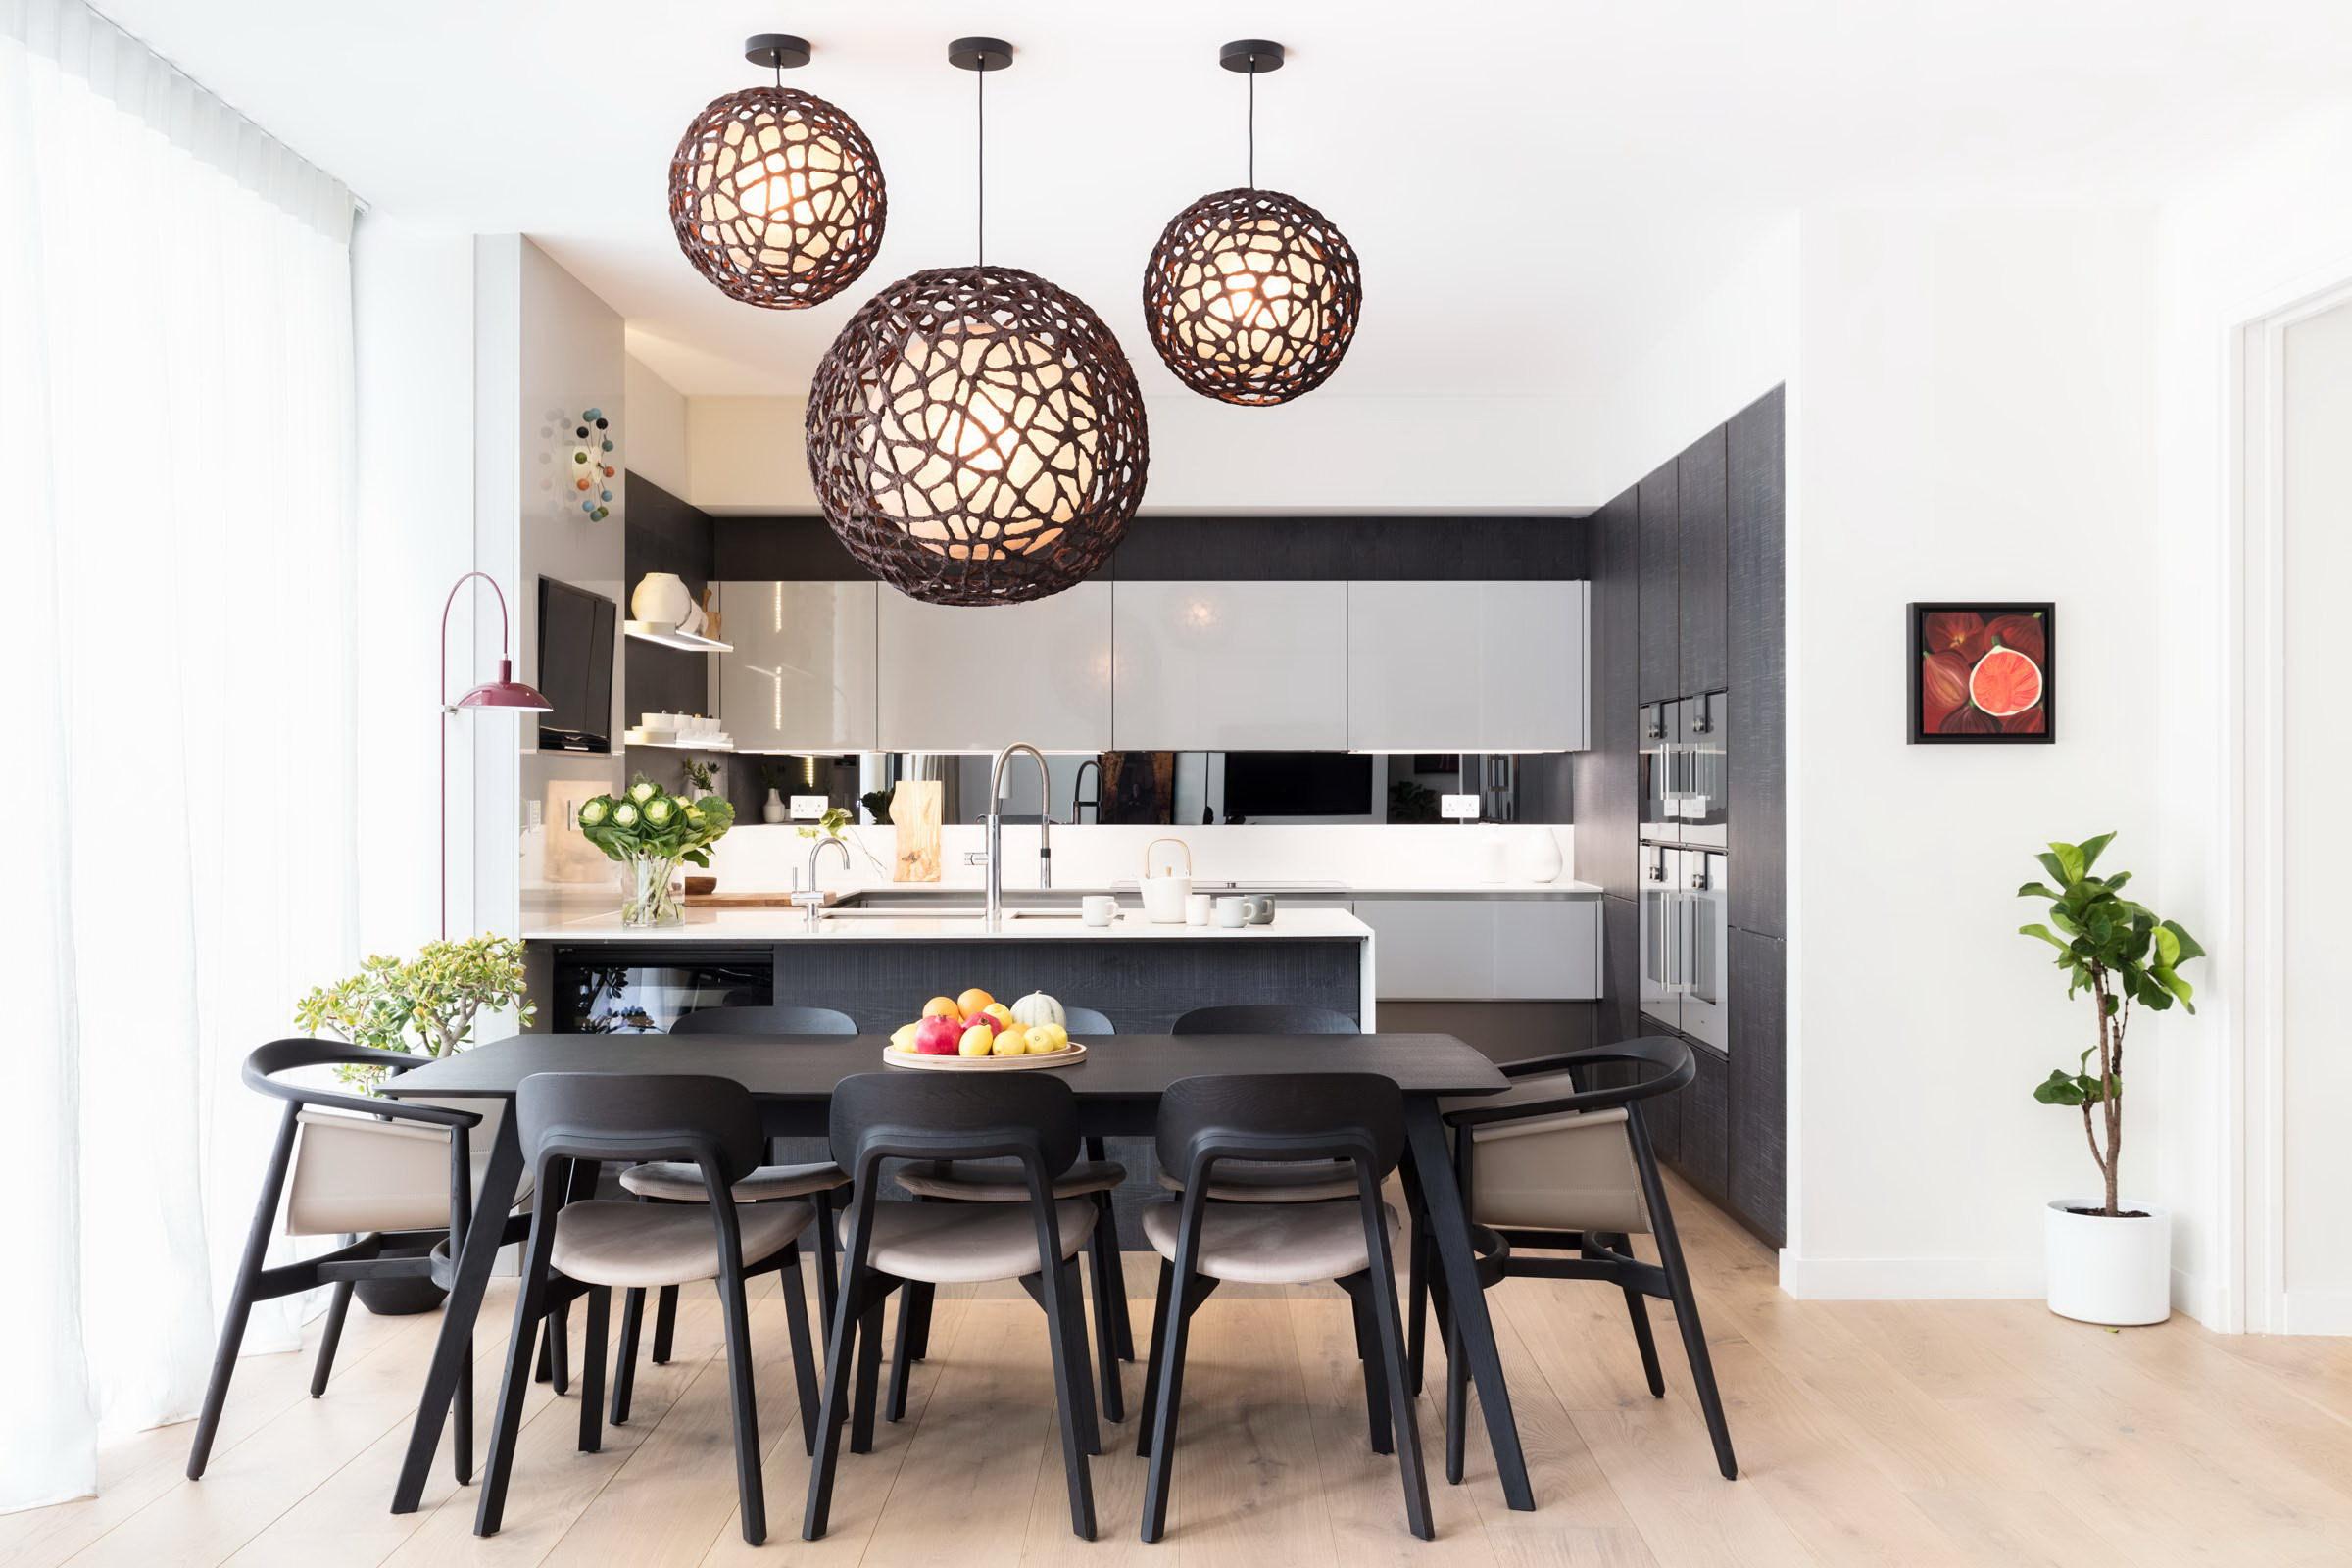 Modern New Home in London by Black & Milk